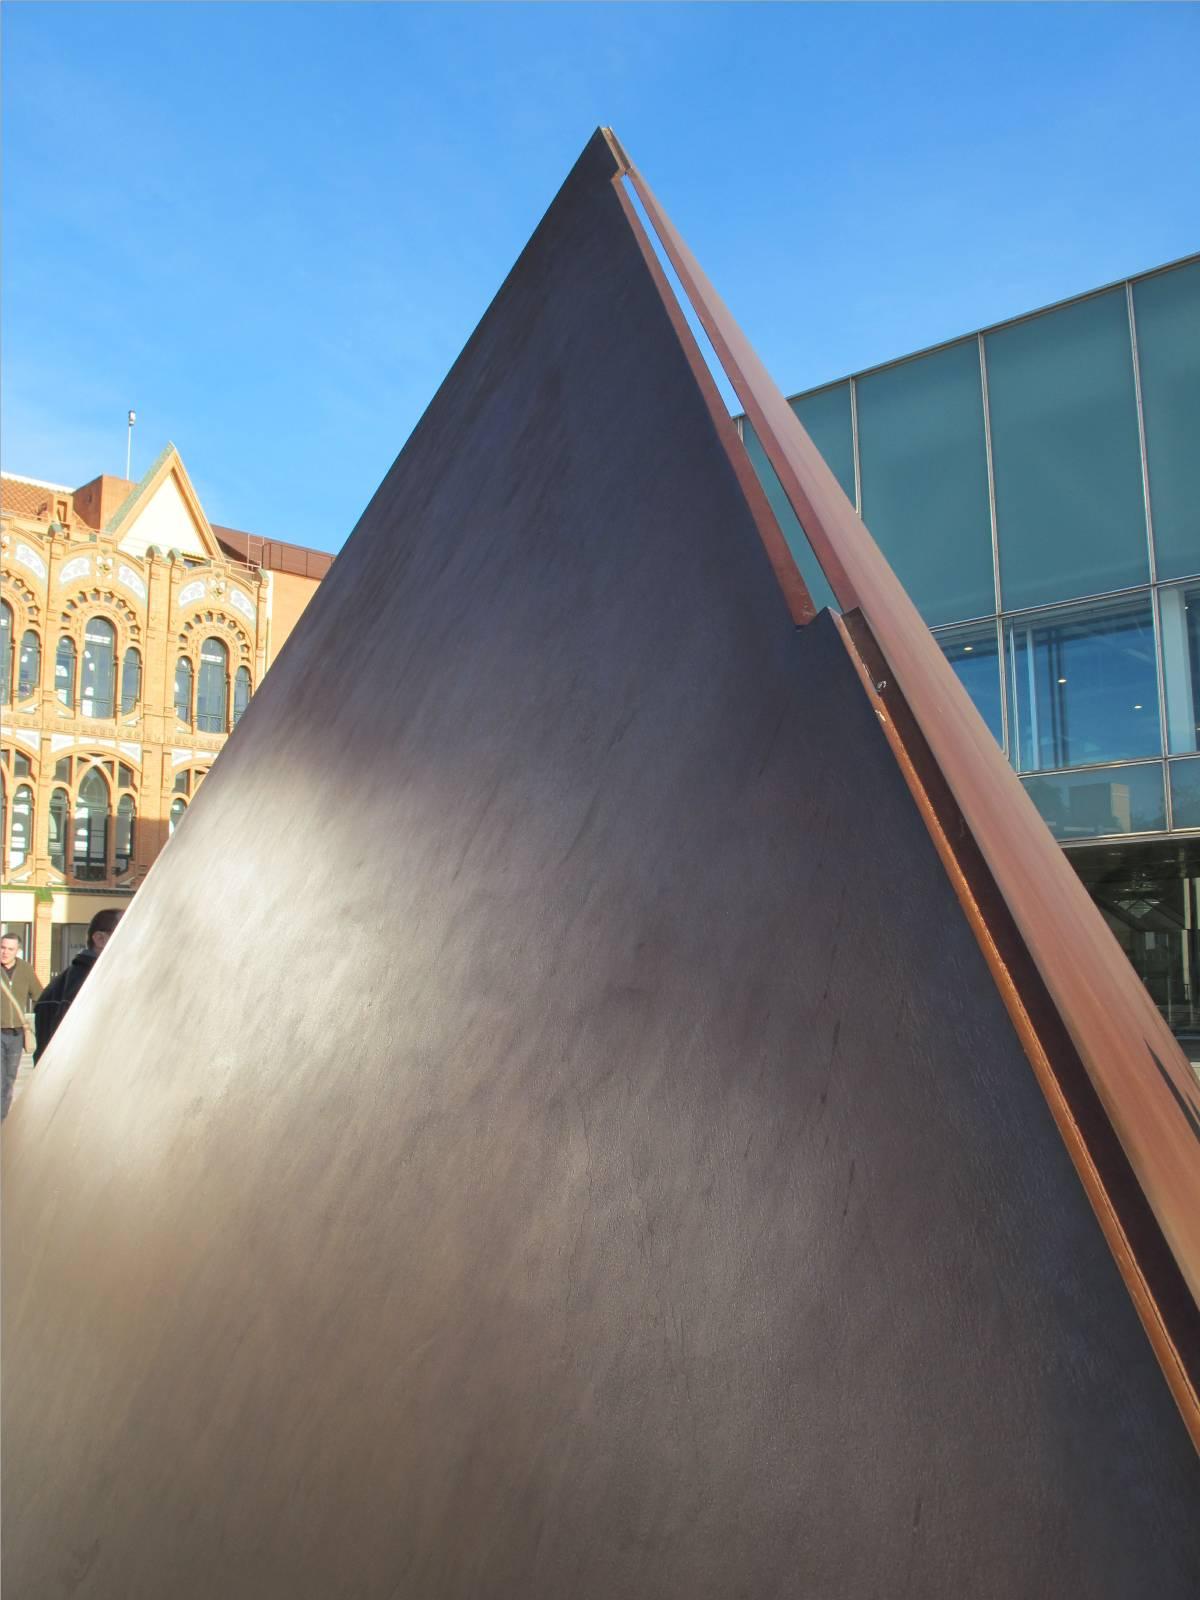 Milerenda: Paseos curiosos por Barcelona (12ª parte)